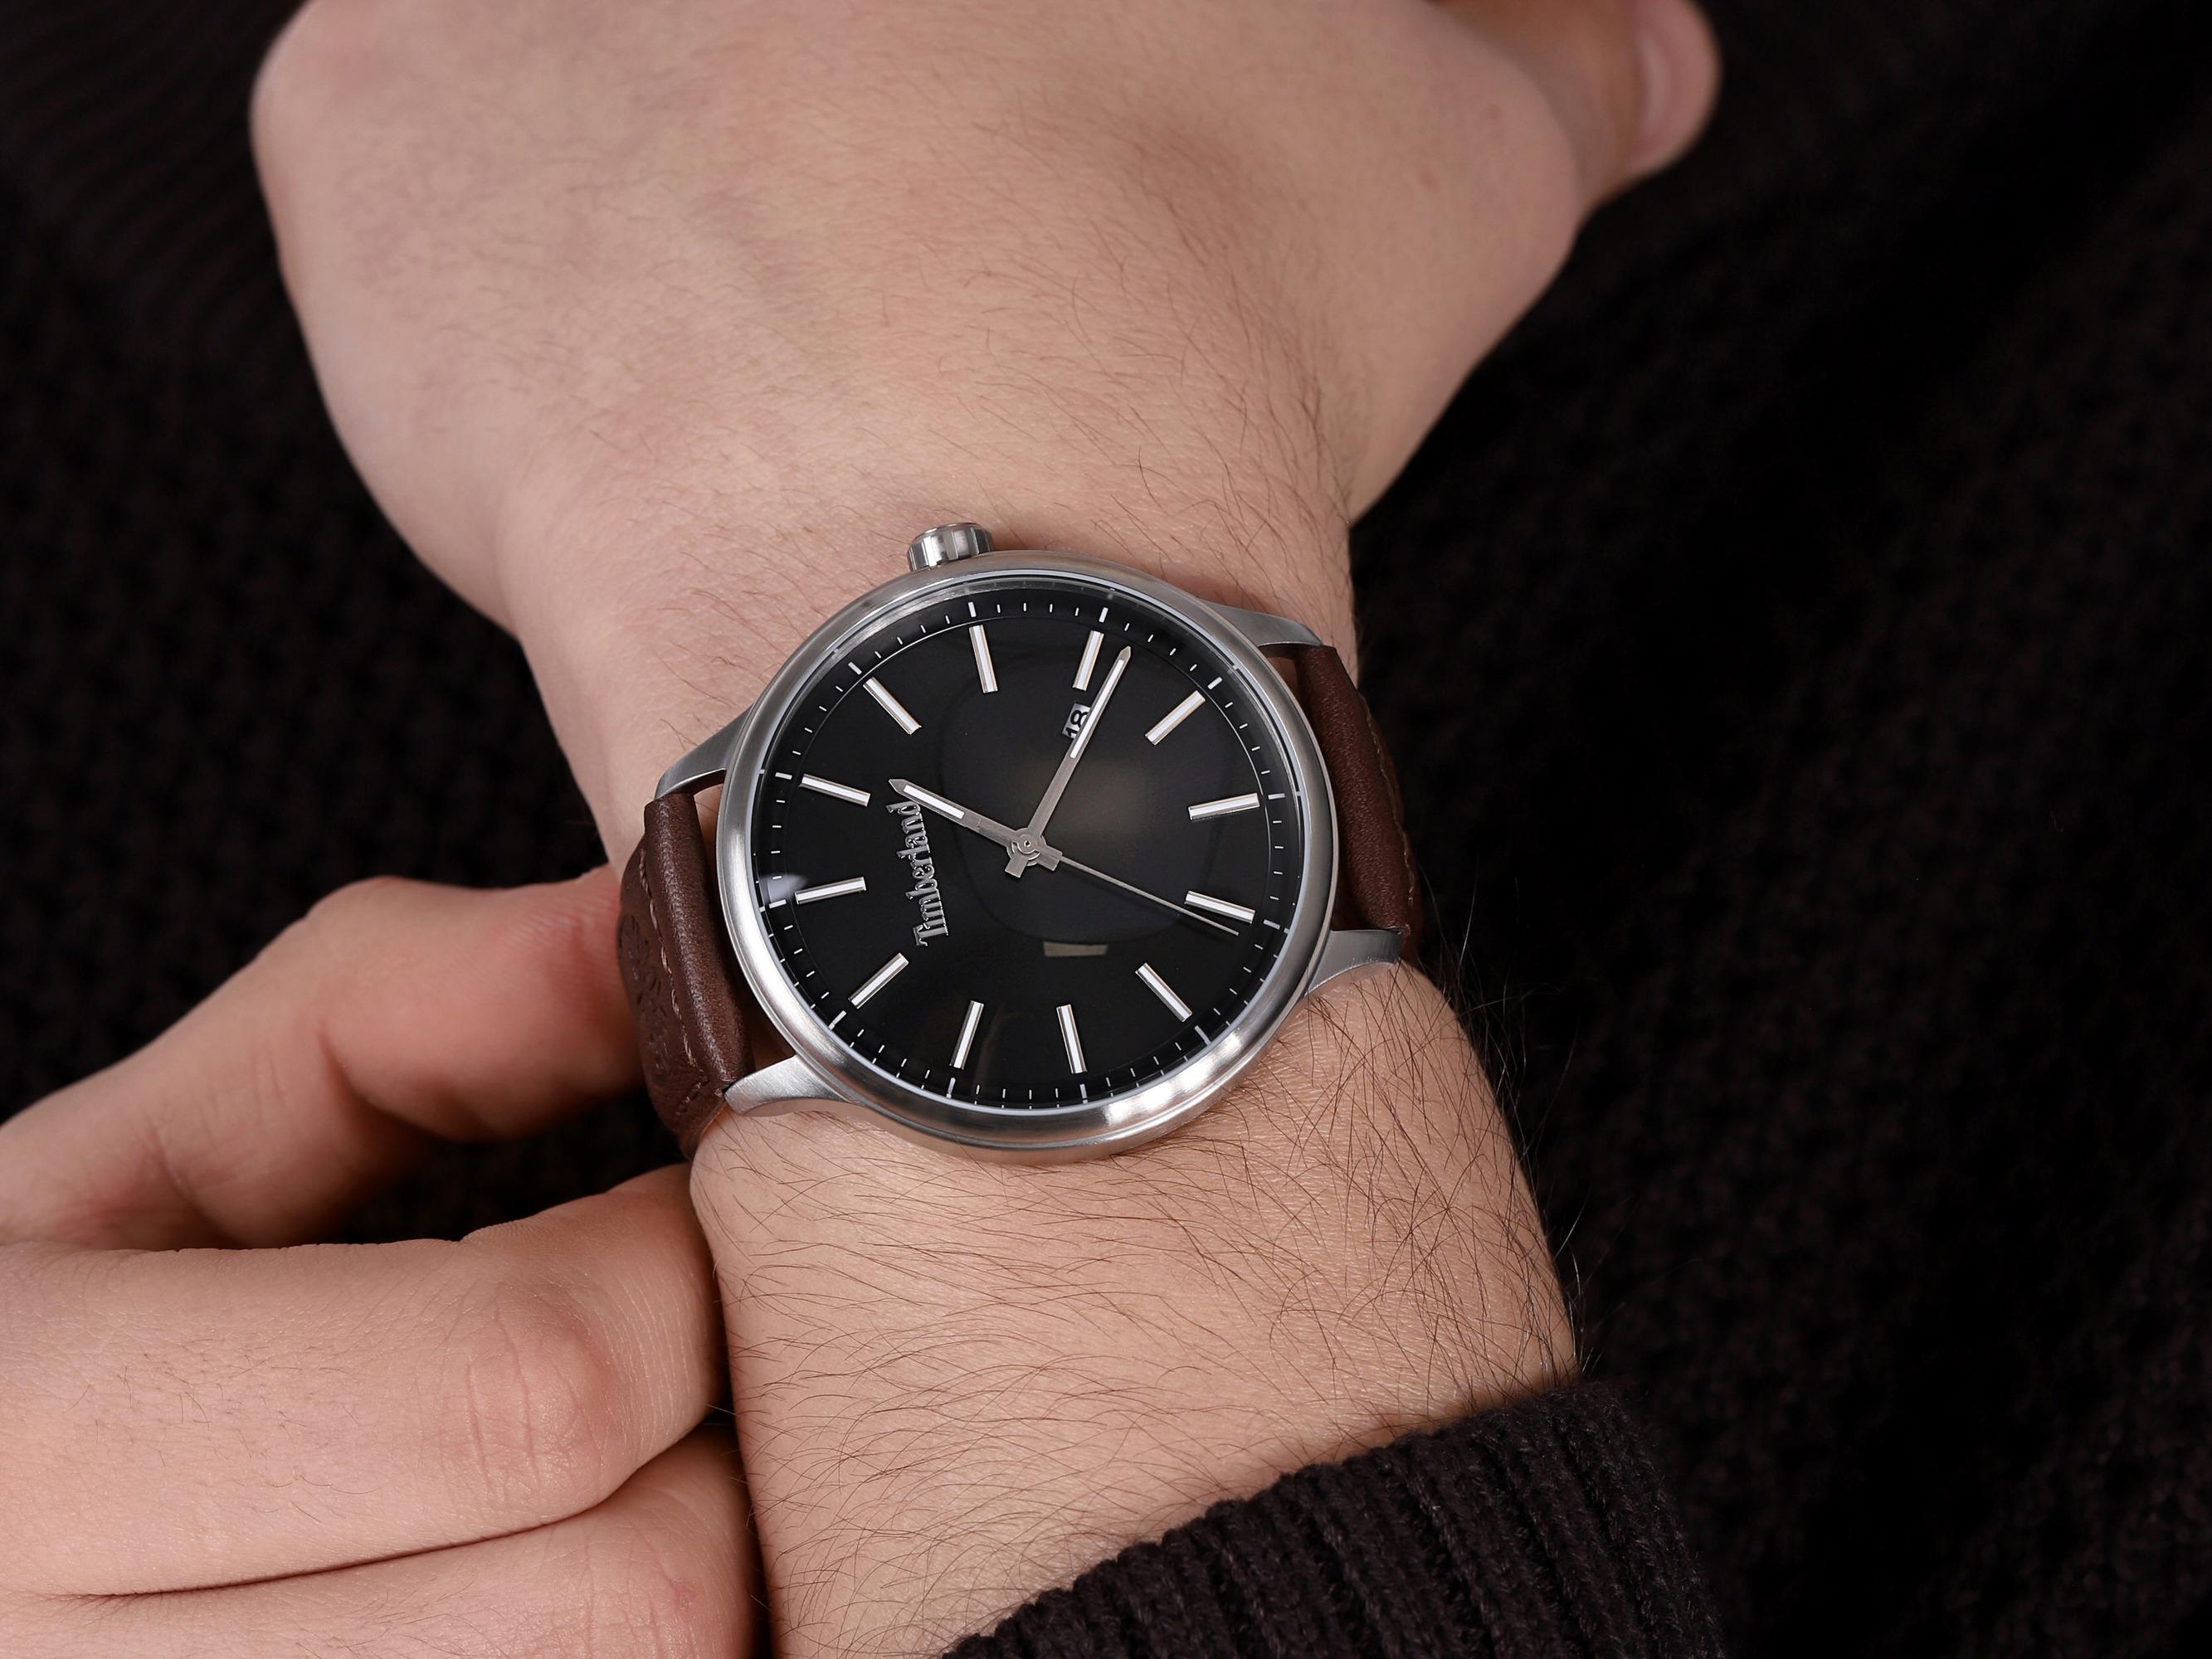 Timberland TBL.15638JS-02 męski zegarek Allendale pasek